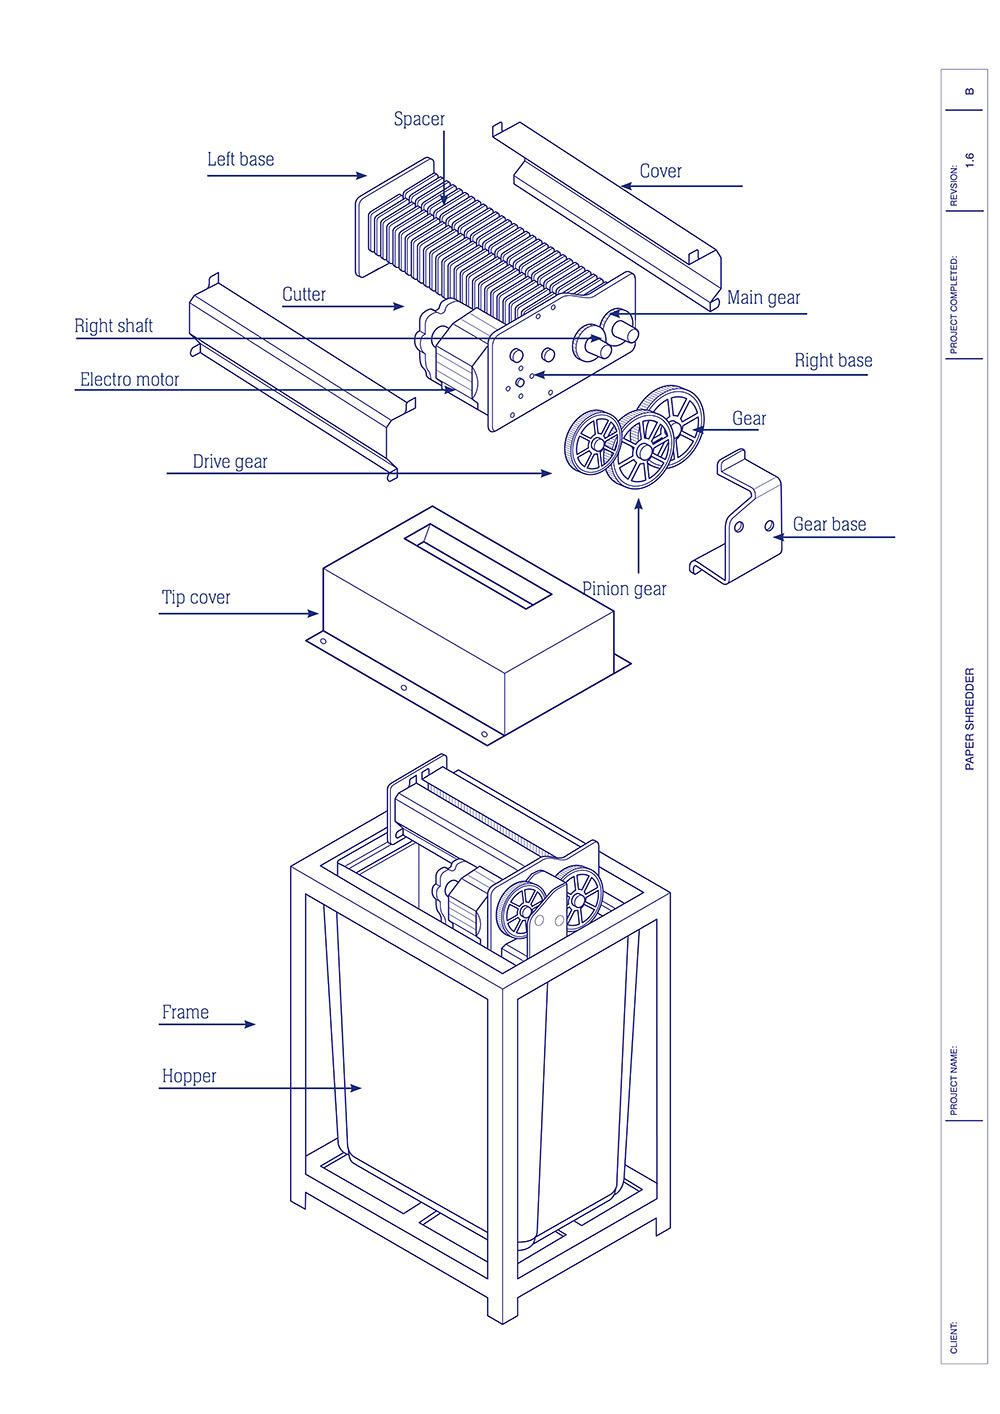 office wiring diagram